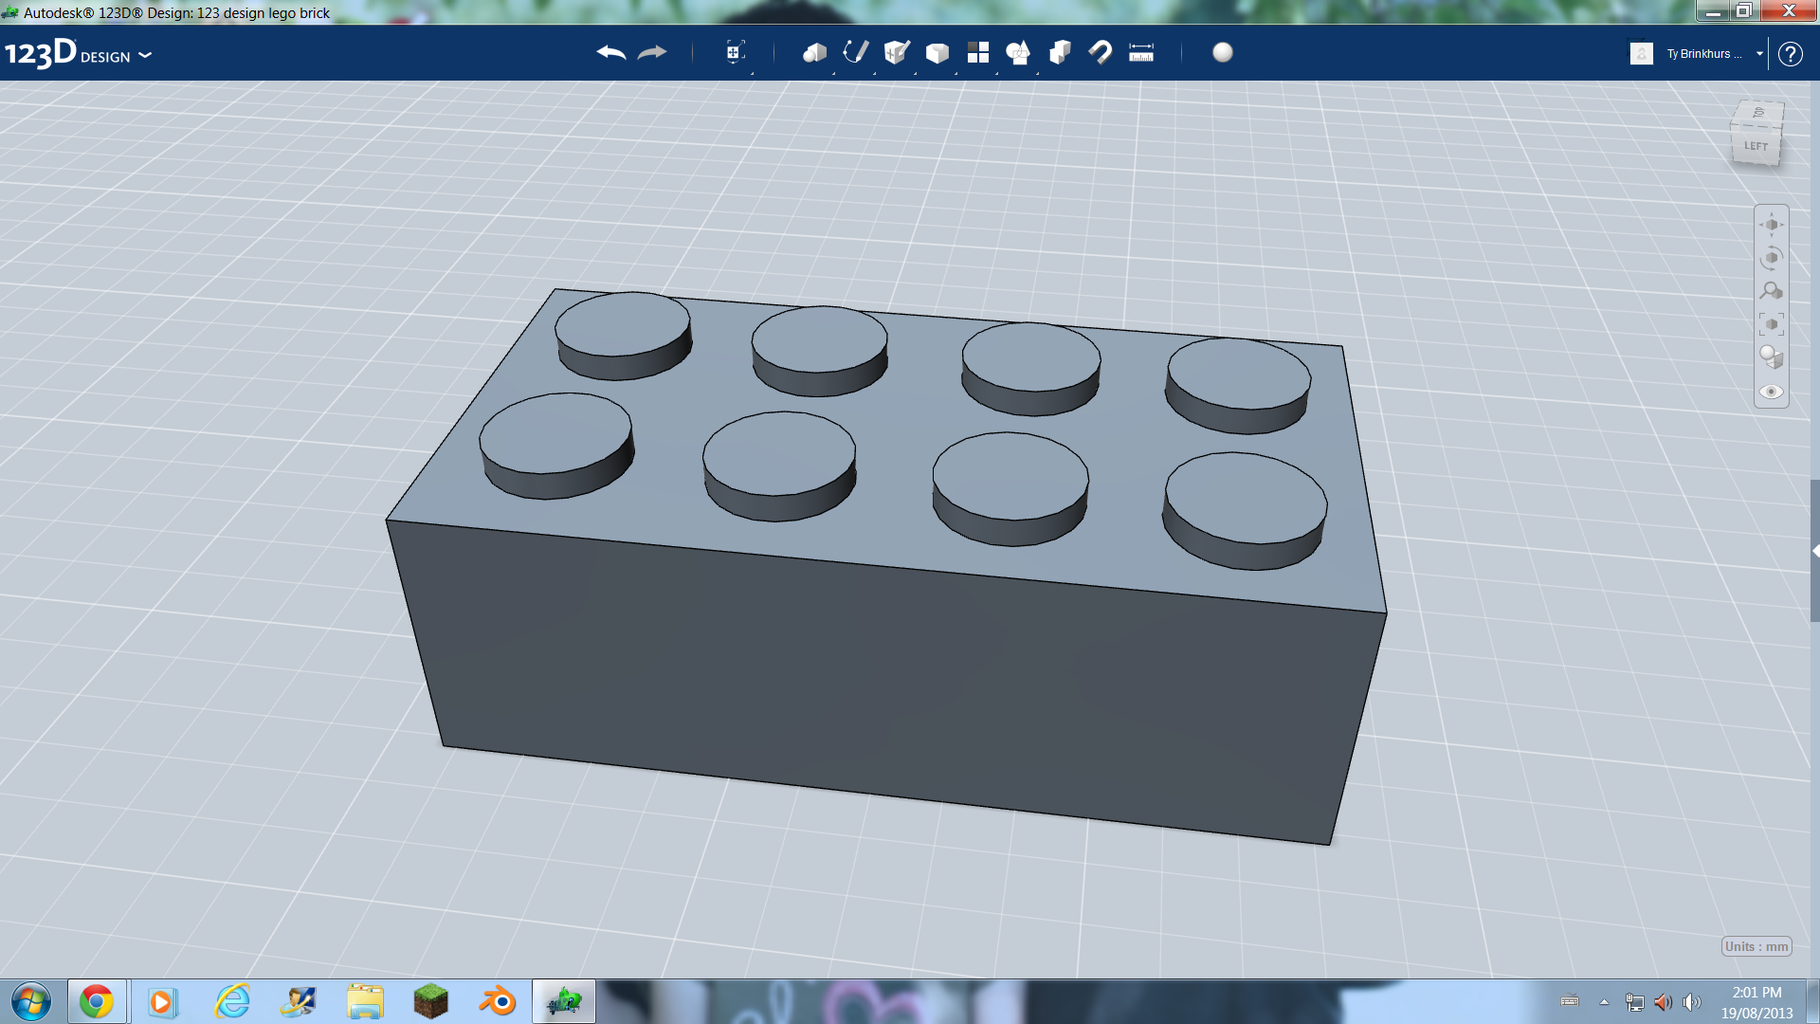 123D Design Lego Brick